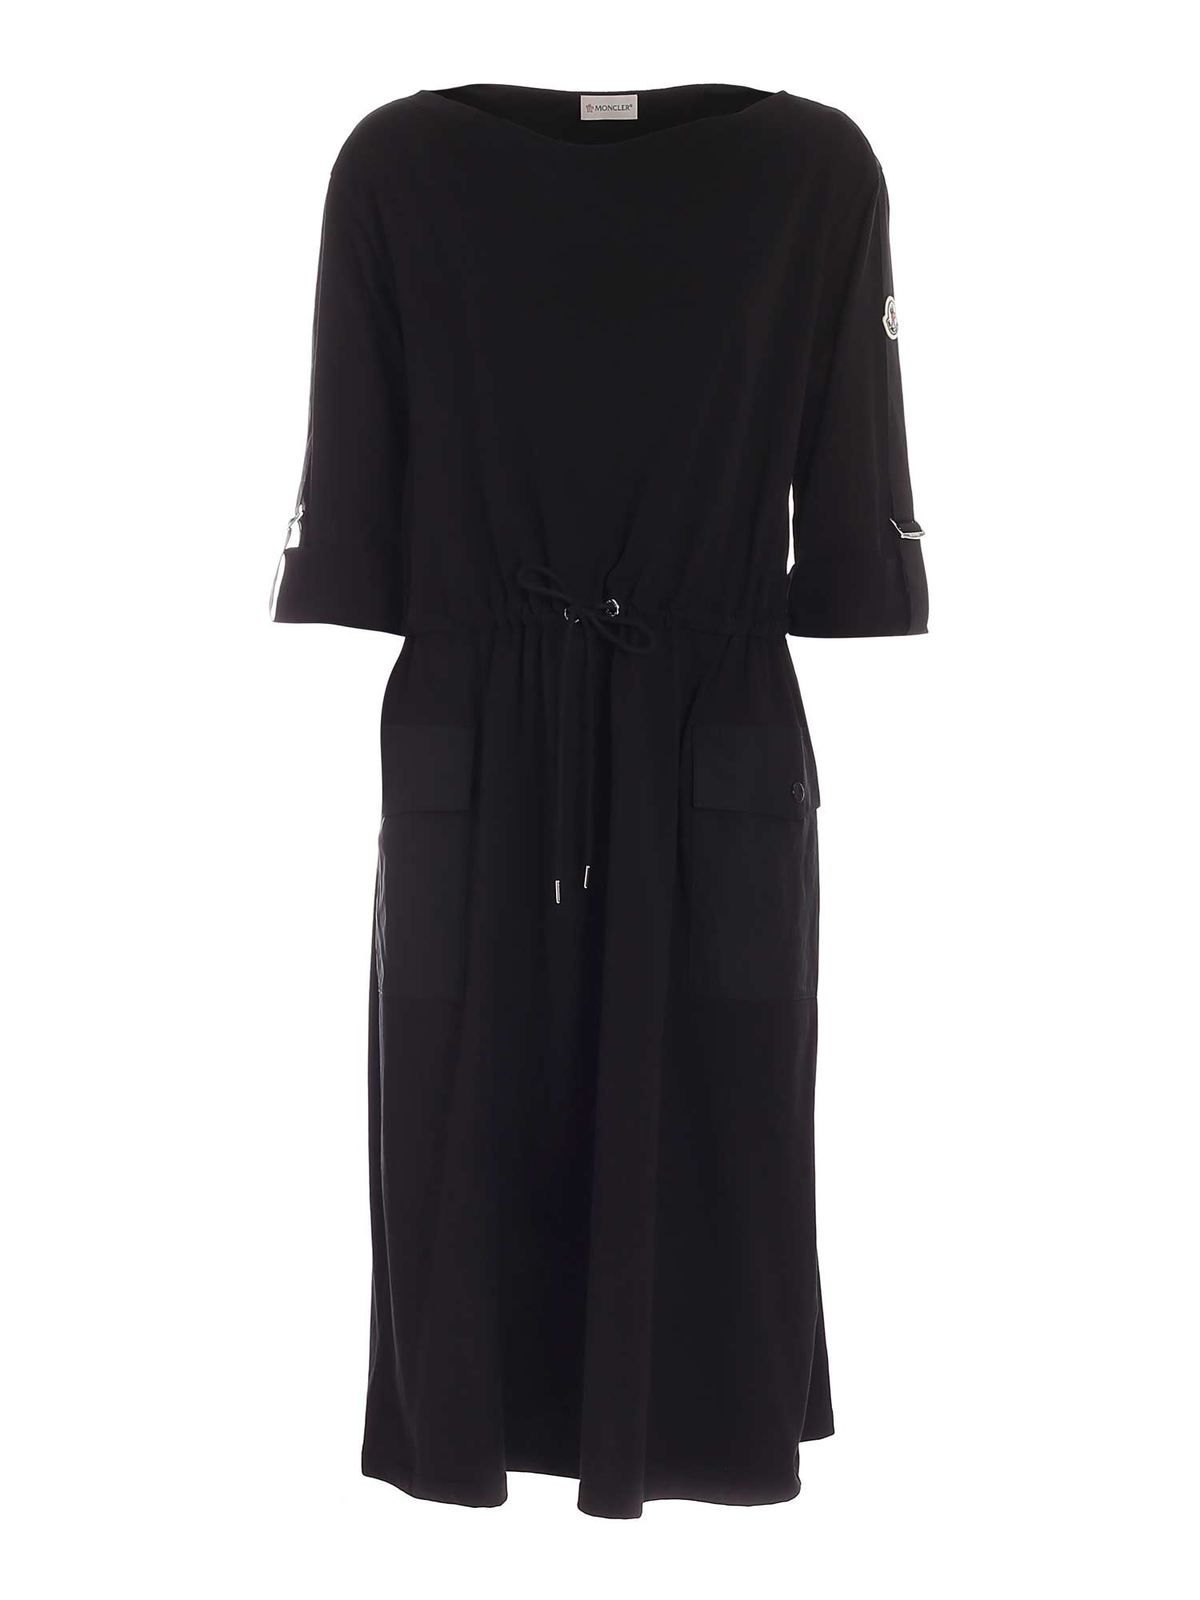 Moncler Midi dresses DRAWSTRING DRESS IN BLACK